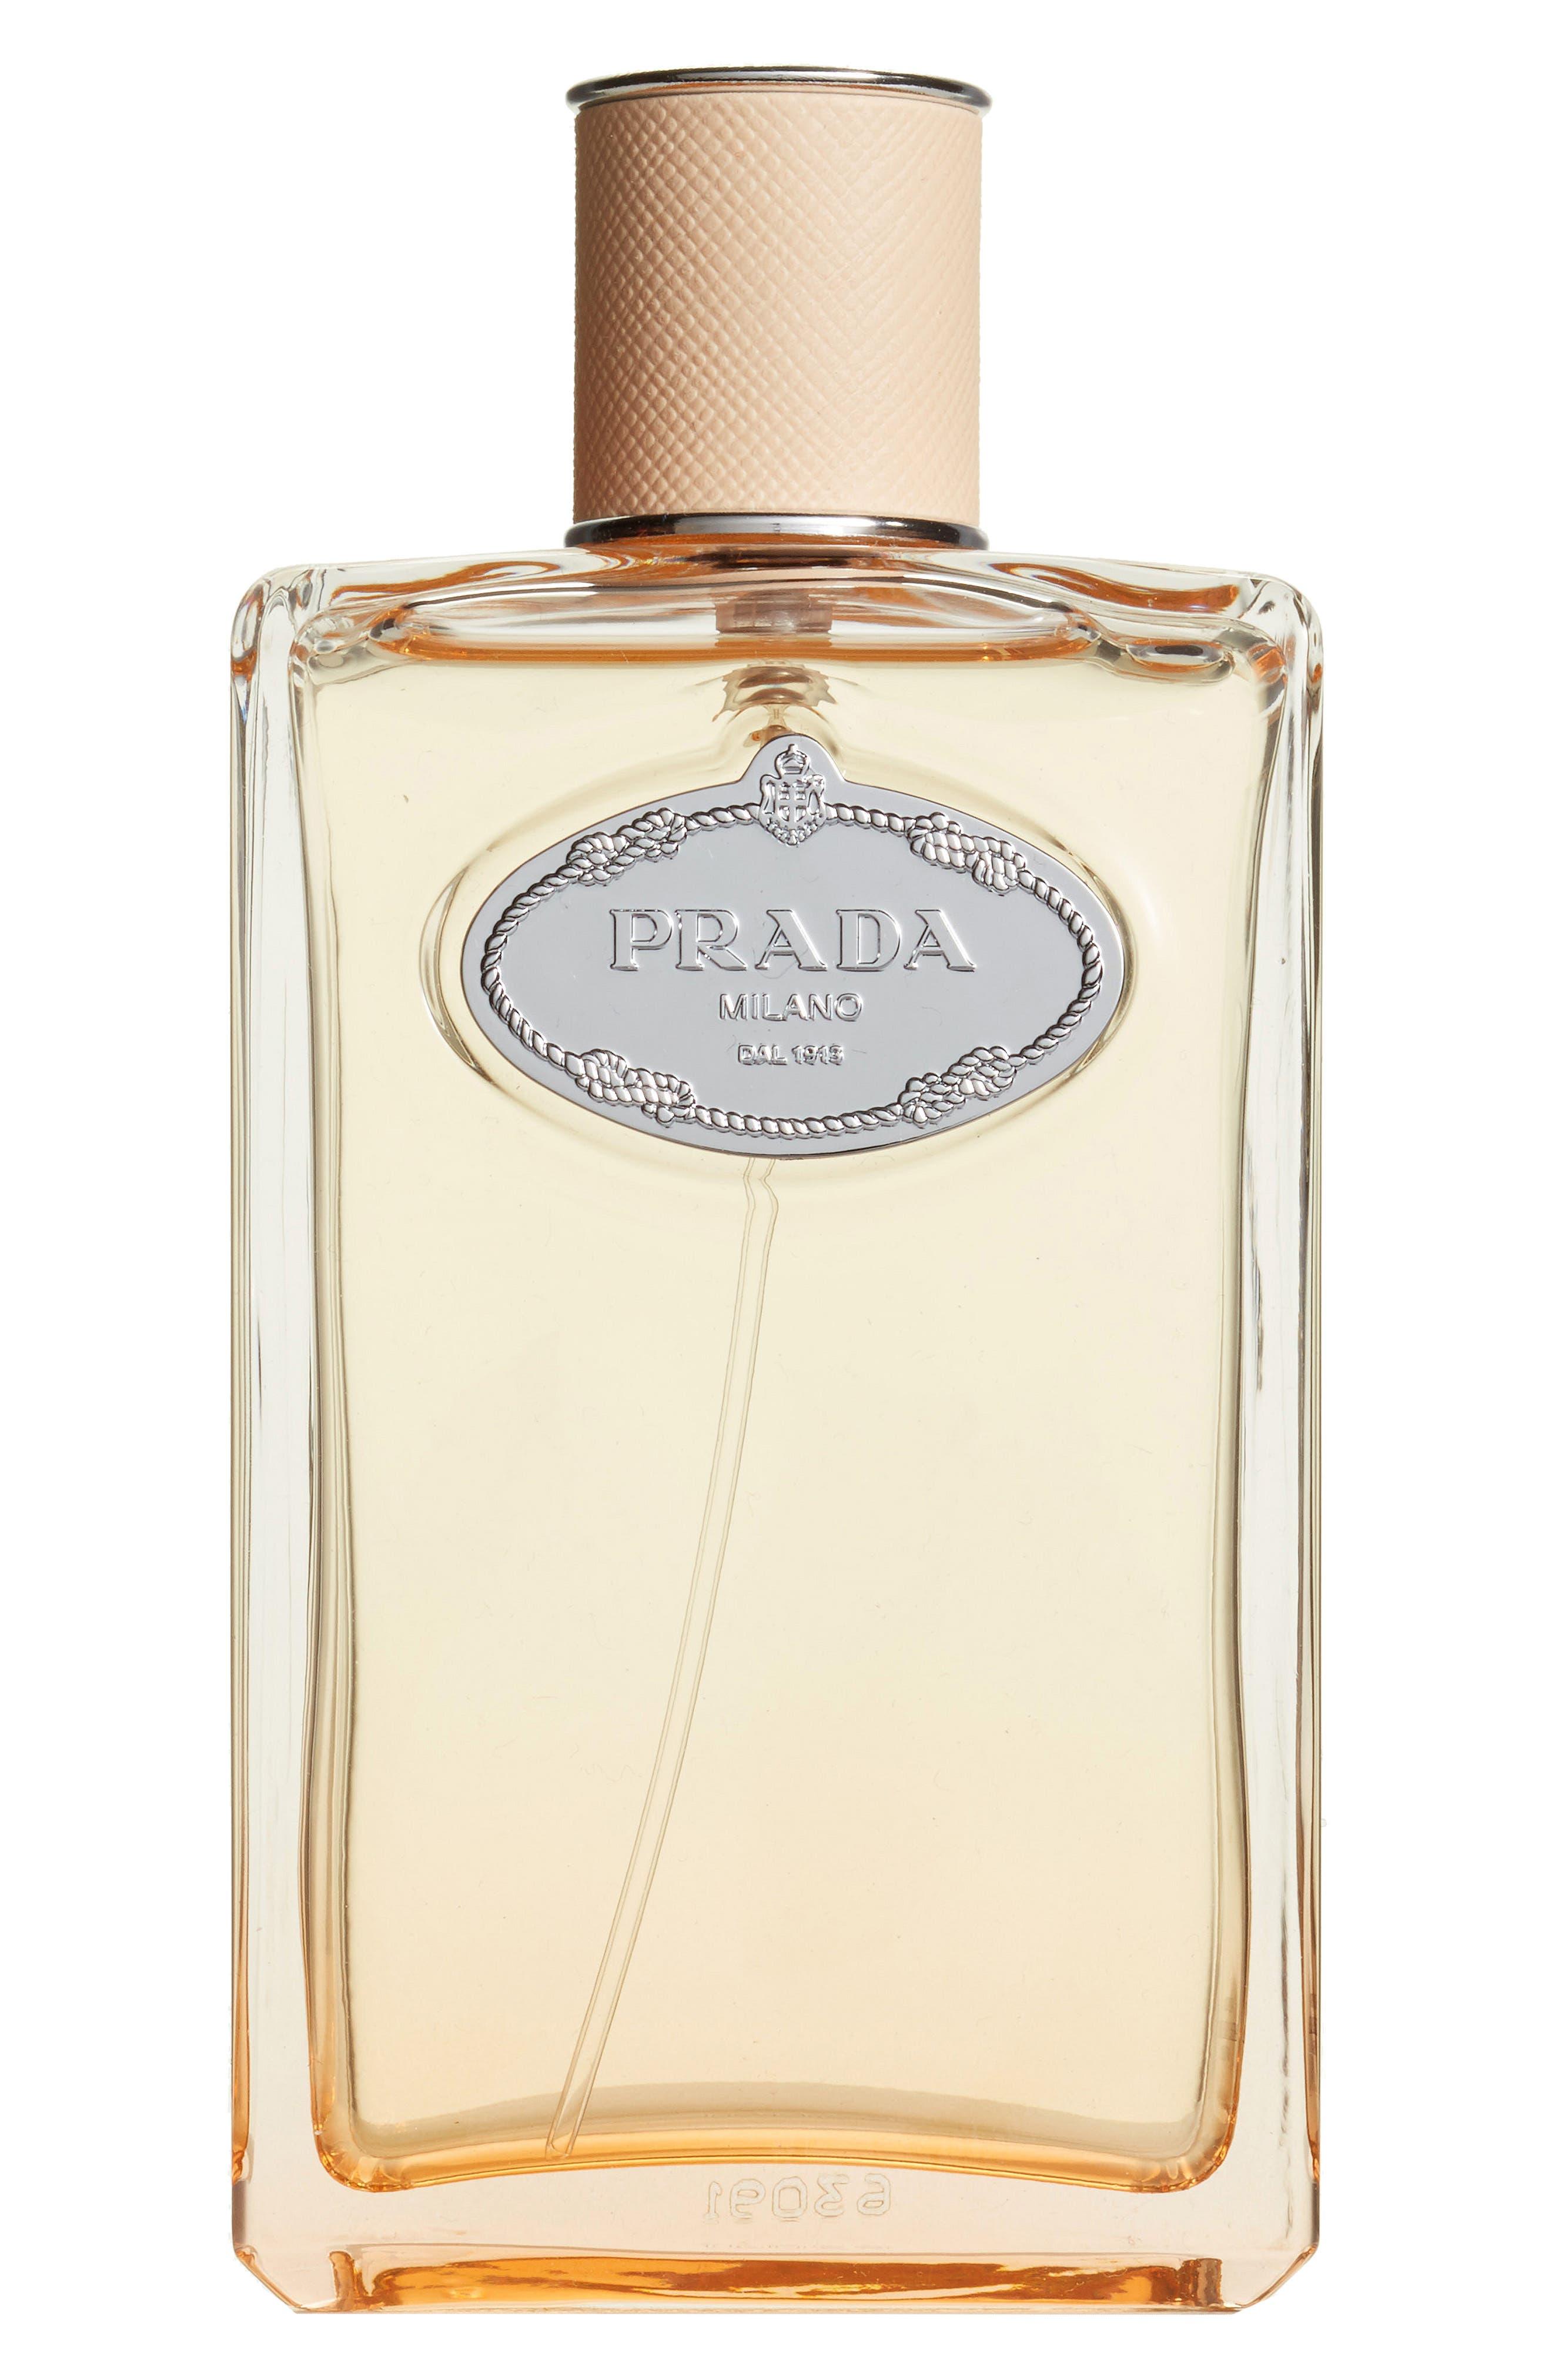 Alternate Image 1 Selected - Prada Les Infusions de Prada Fleur d'Oranger (Limited Edition)